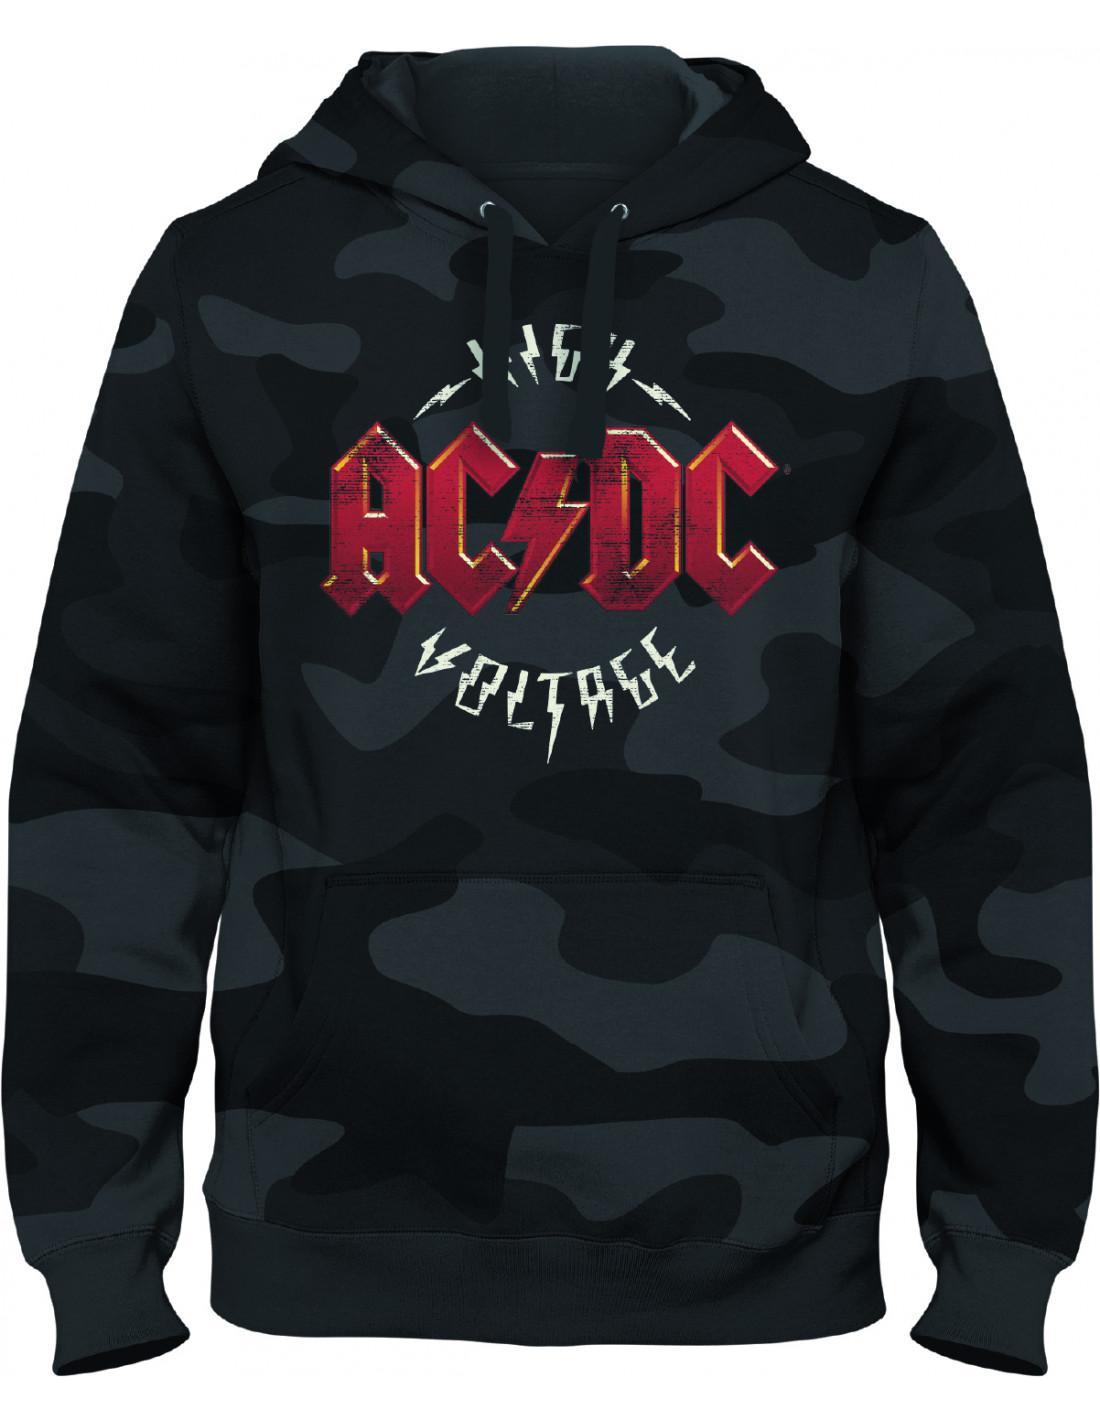 Sweat shirt acdc military acdc